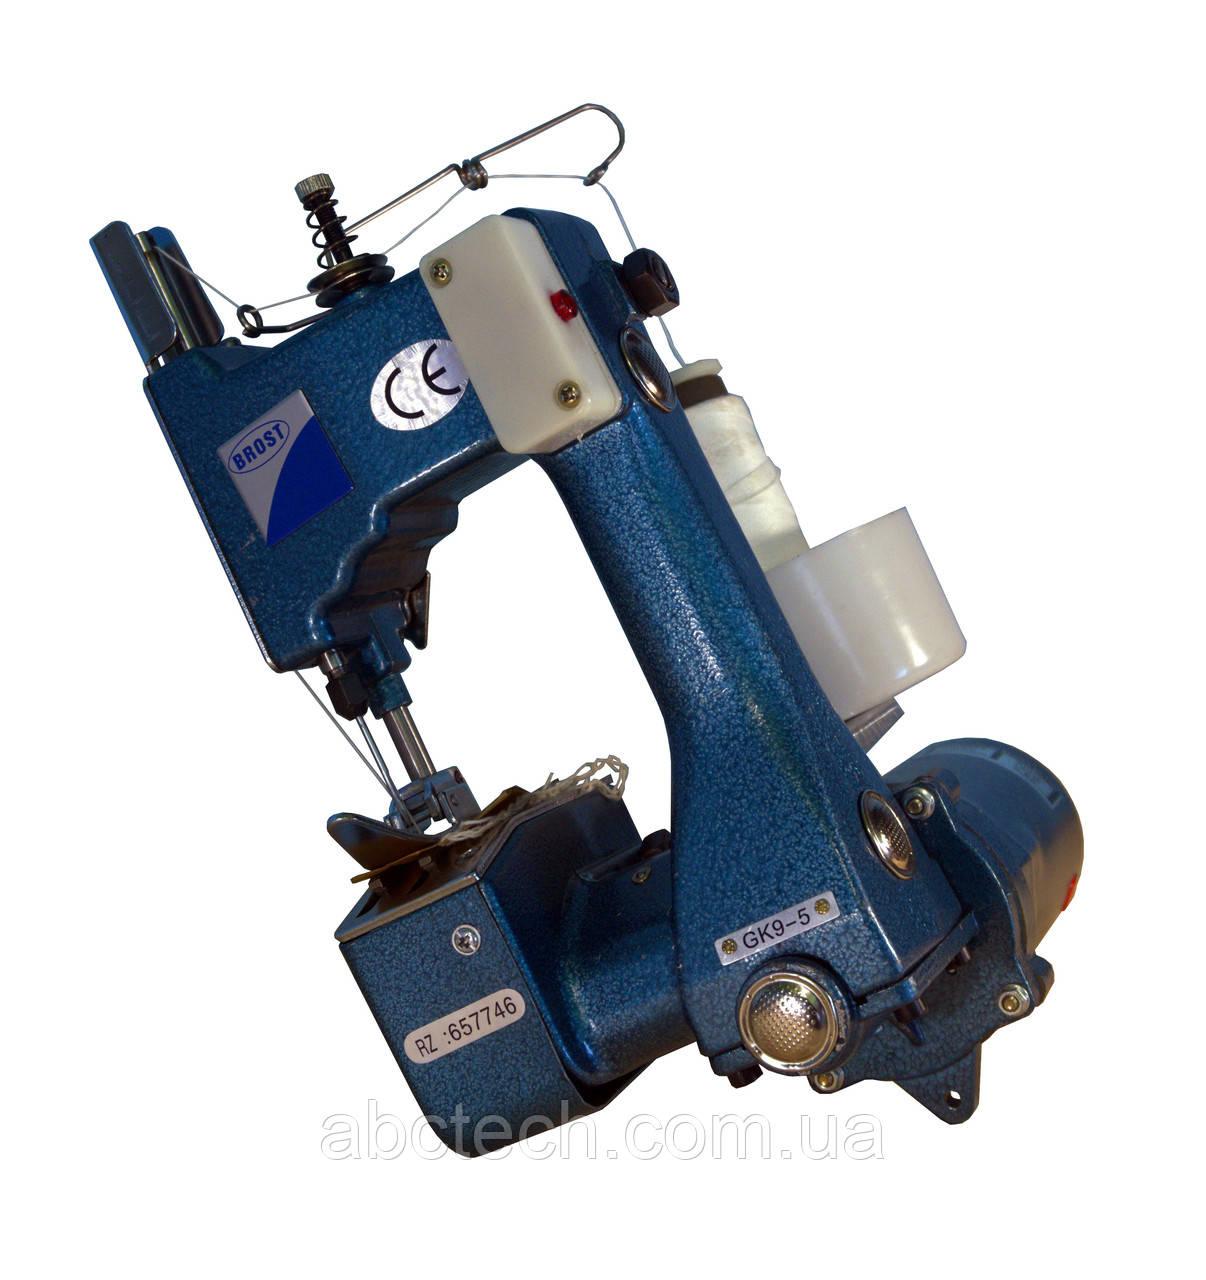 Мешкозашивочная машинка GK 9-5 500 мешков смена